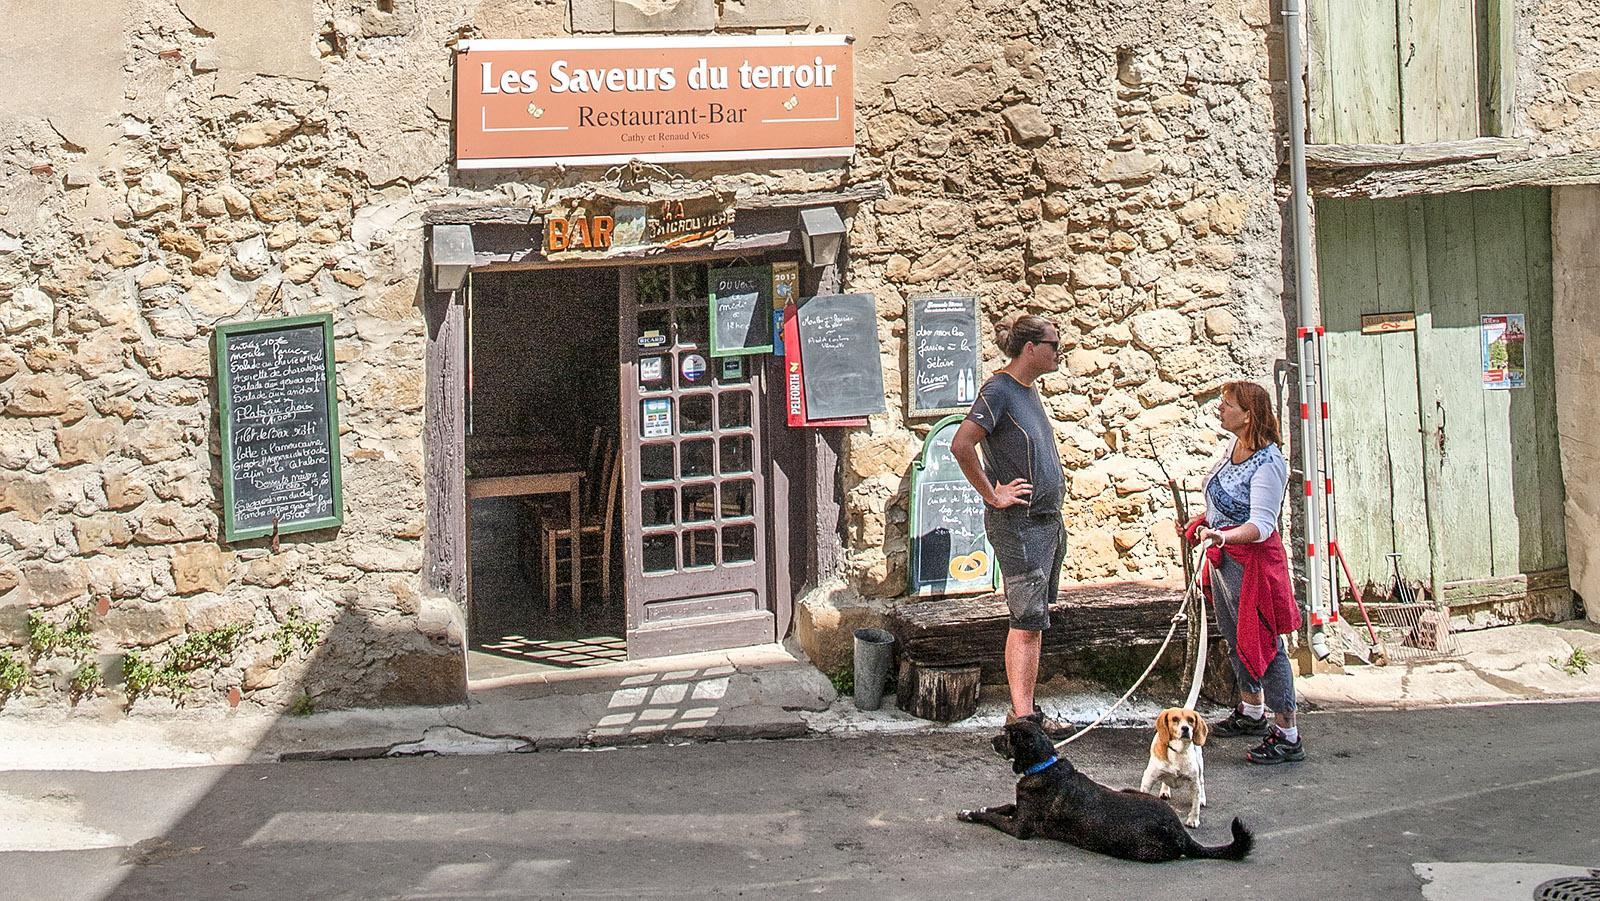 Bugarach: Sauveurs du Terroirs. Foto: Hilke Maunder